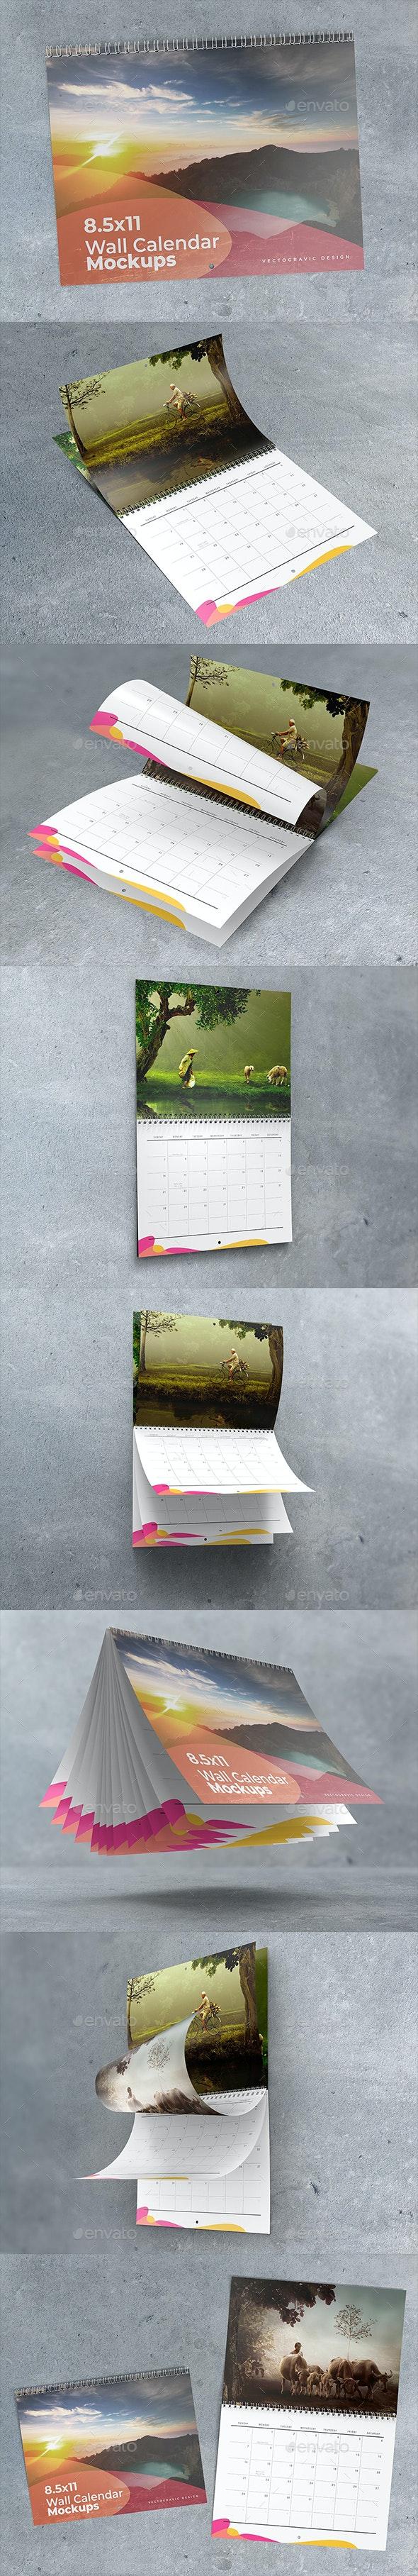 8.5×11 Wall Calendar Mockups - Stationery Print